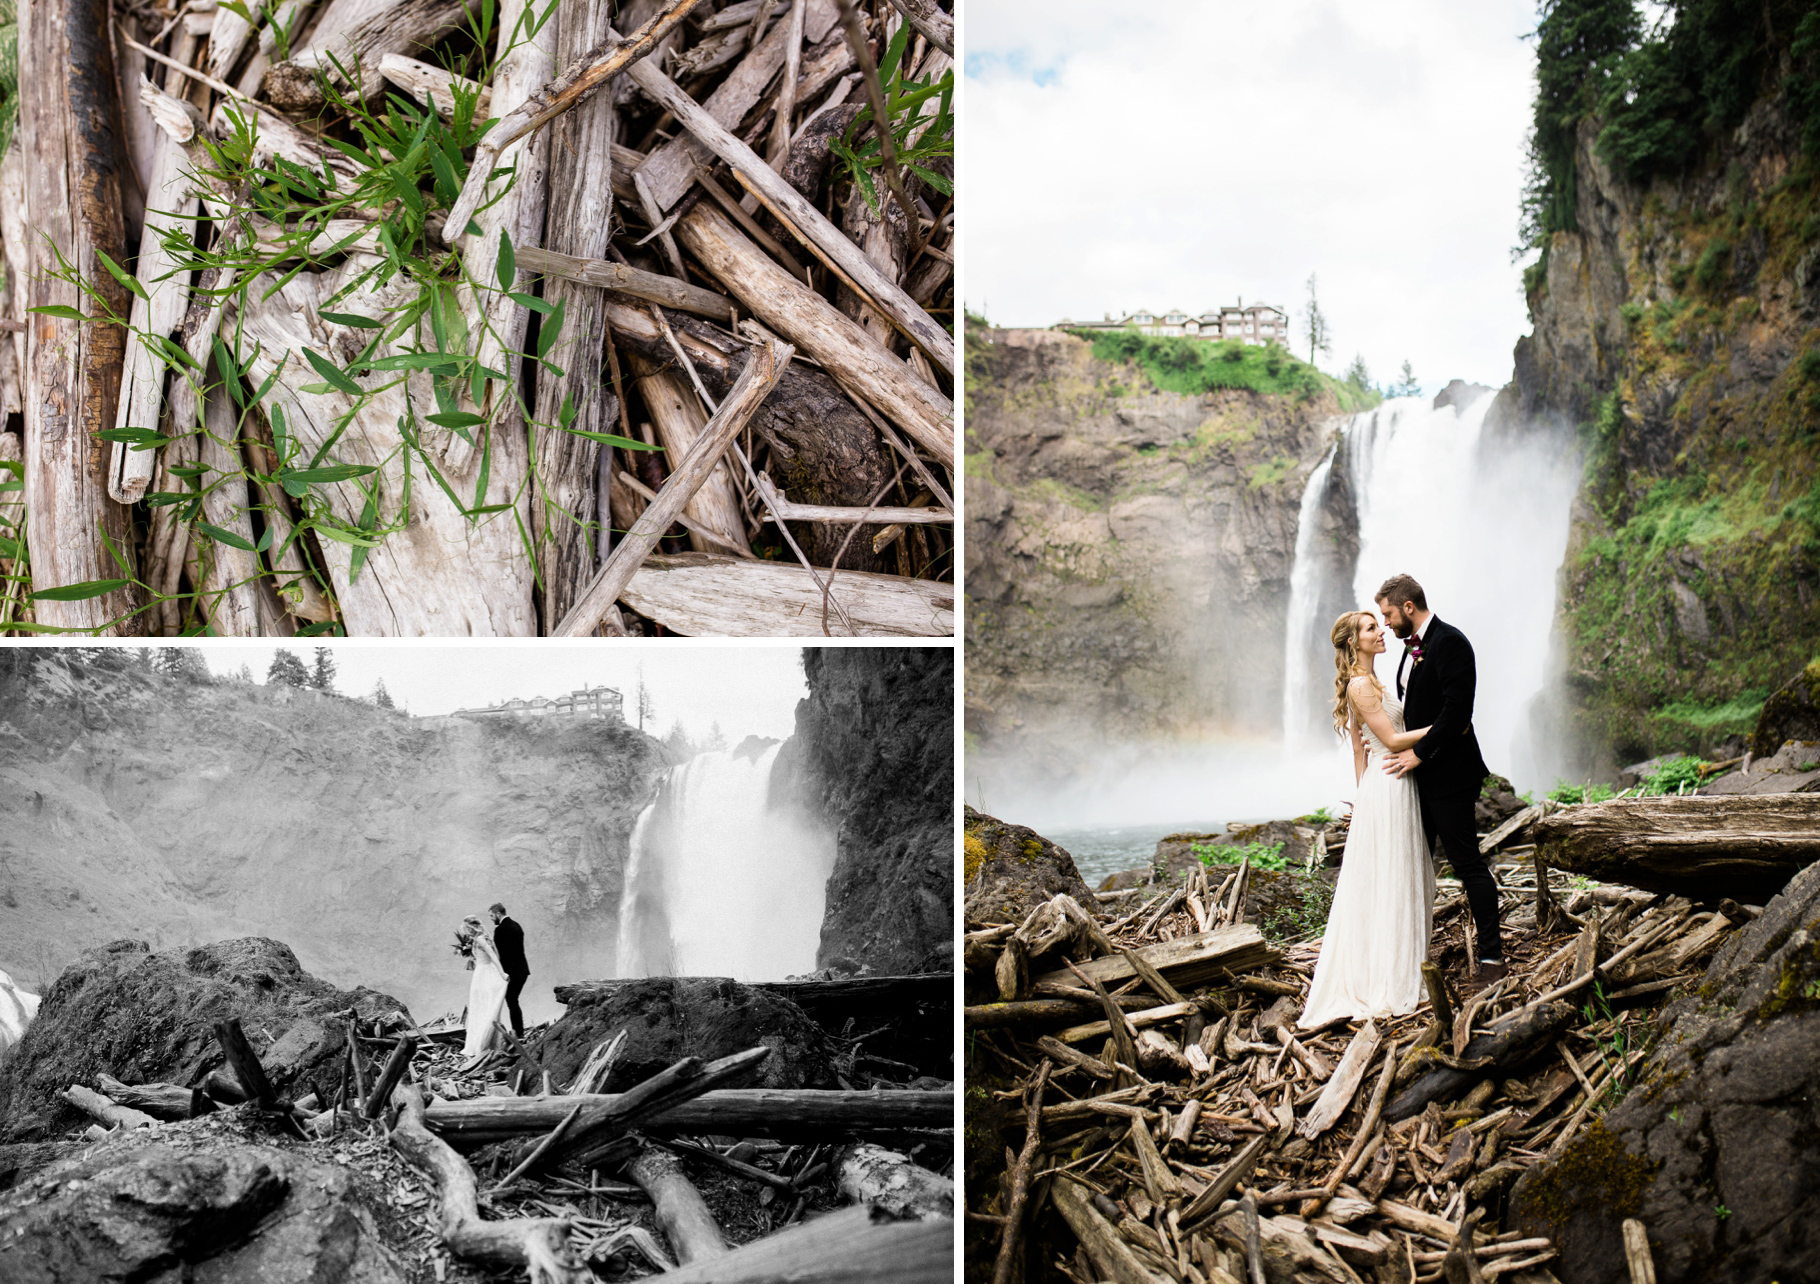 20-Adventure-Elopement-Waterfall-Seattle-Wedding-Photographer-Snoqualmie-Falls-Hike